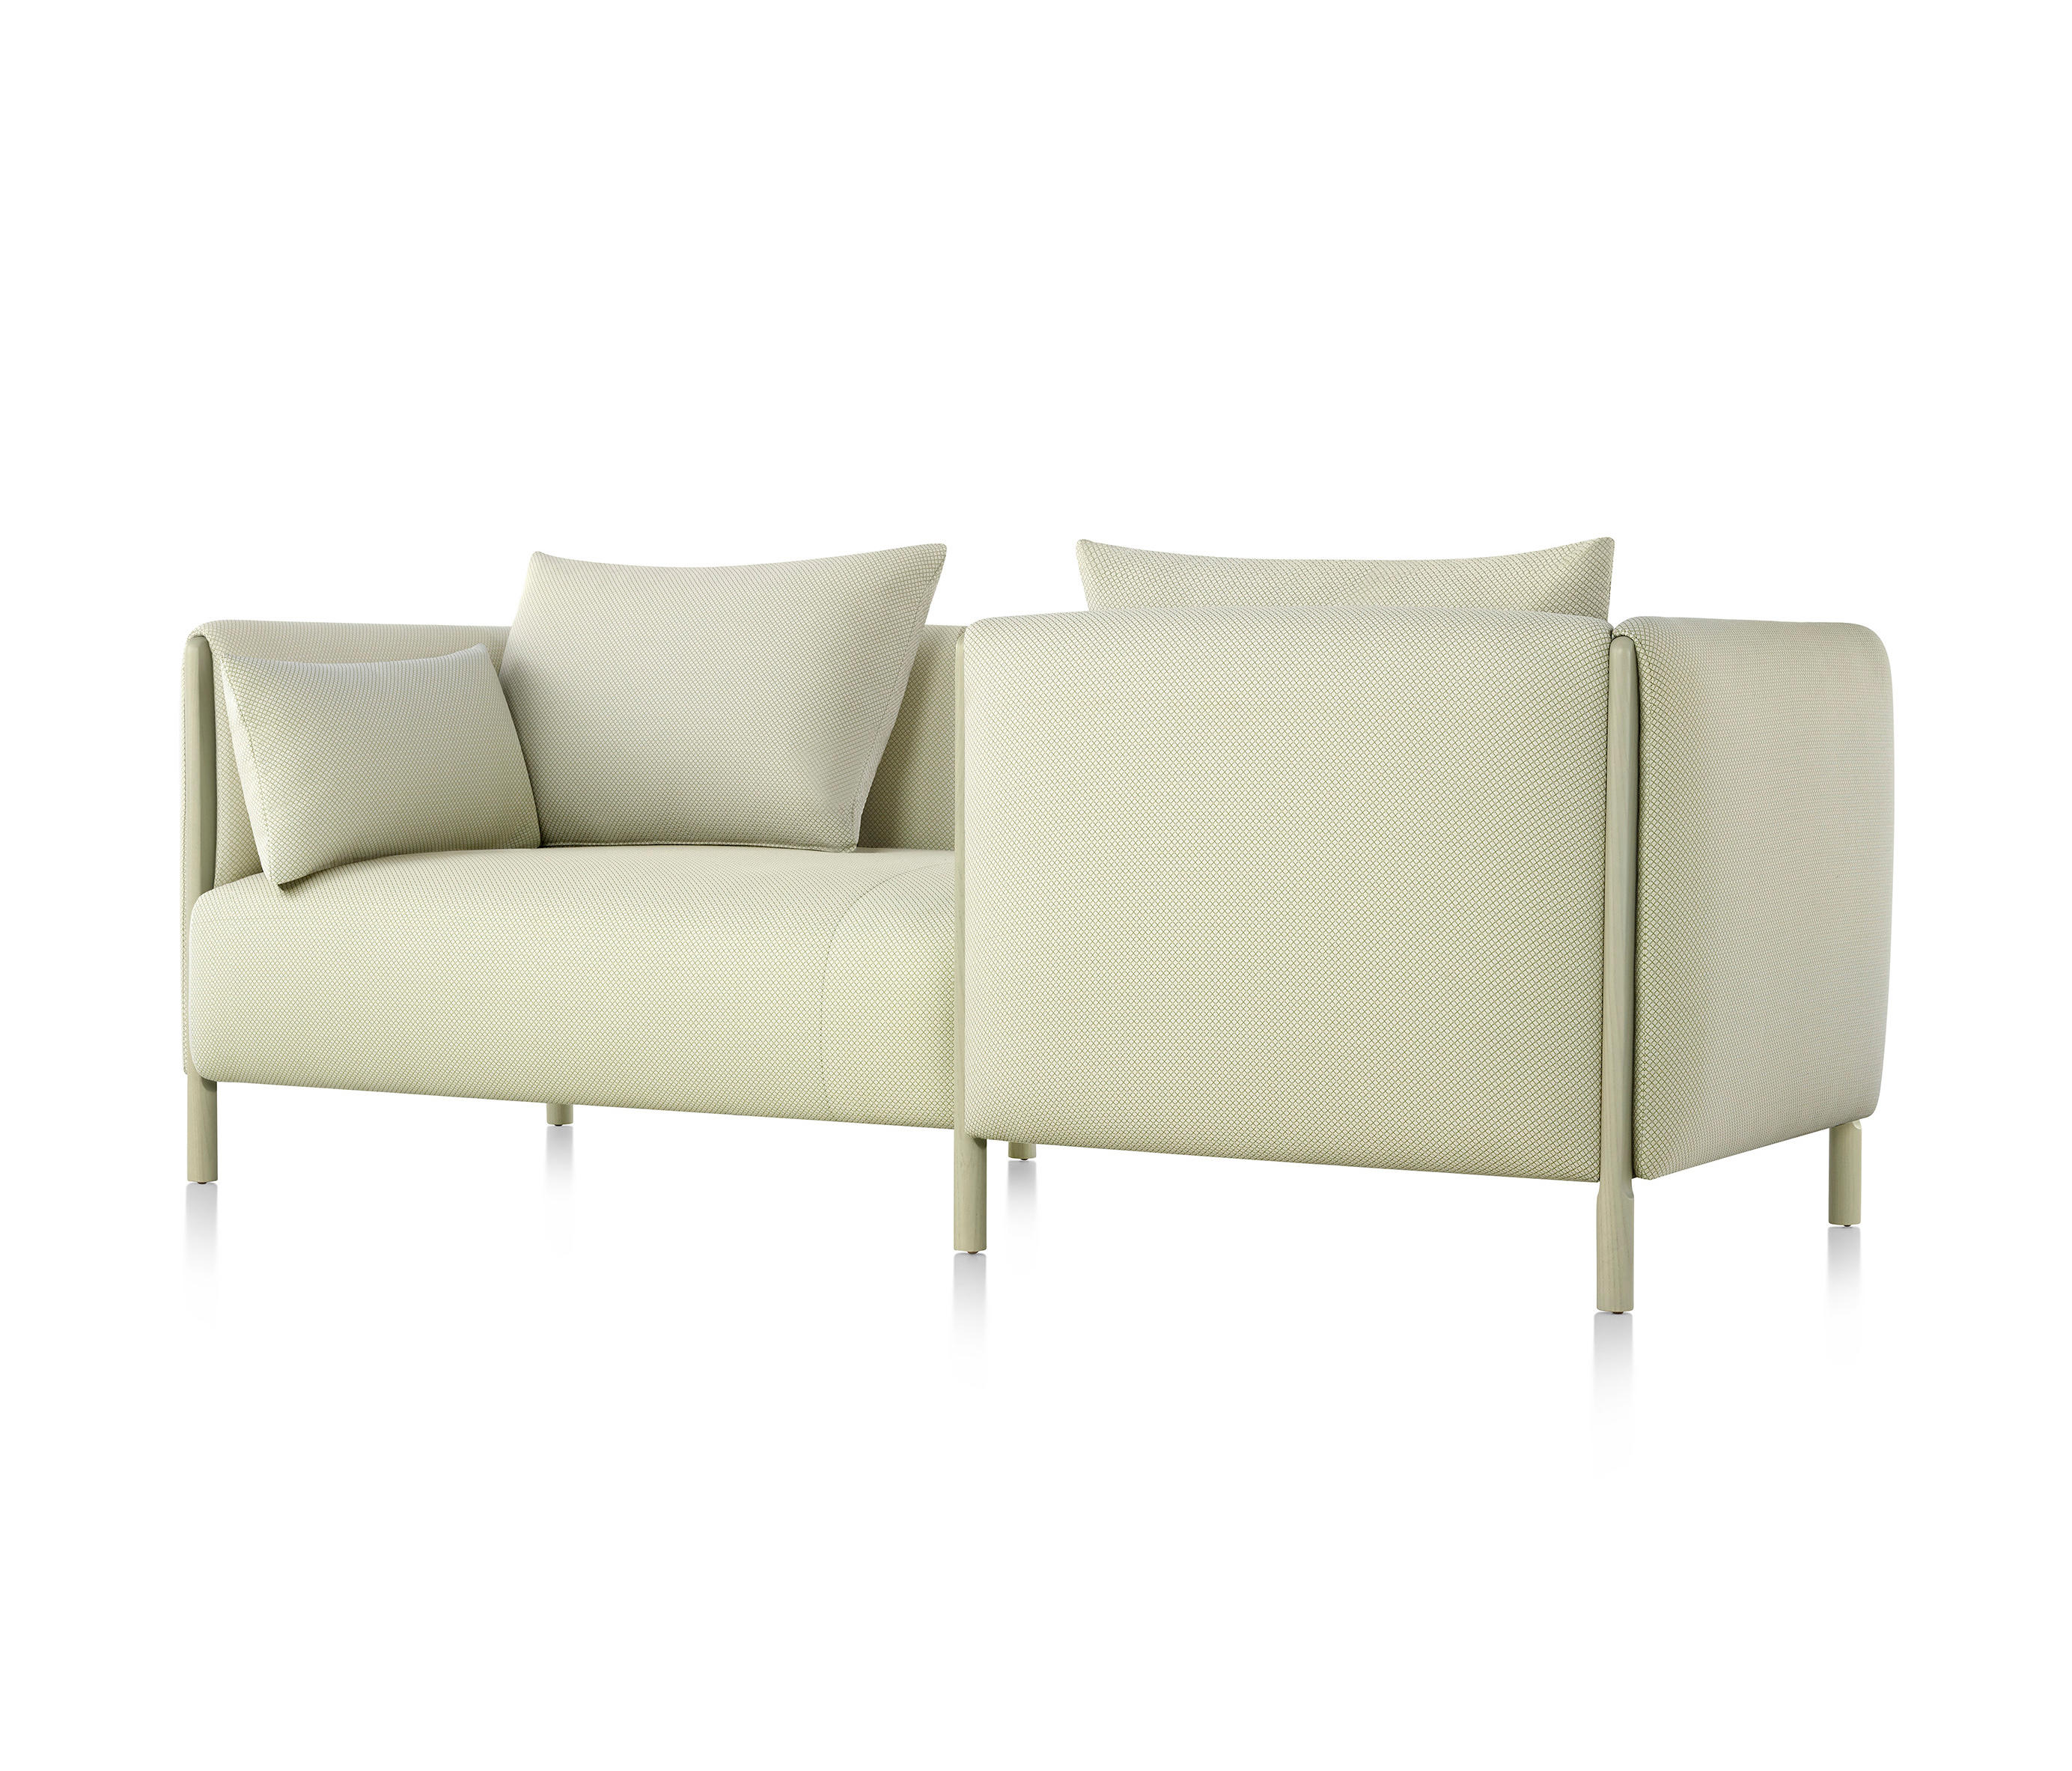 ColourForm Sofagruppe & Designermöbel | Architonic